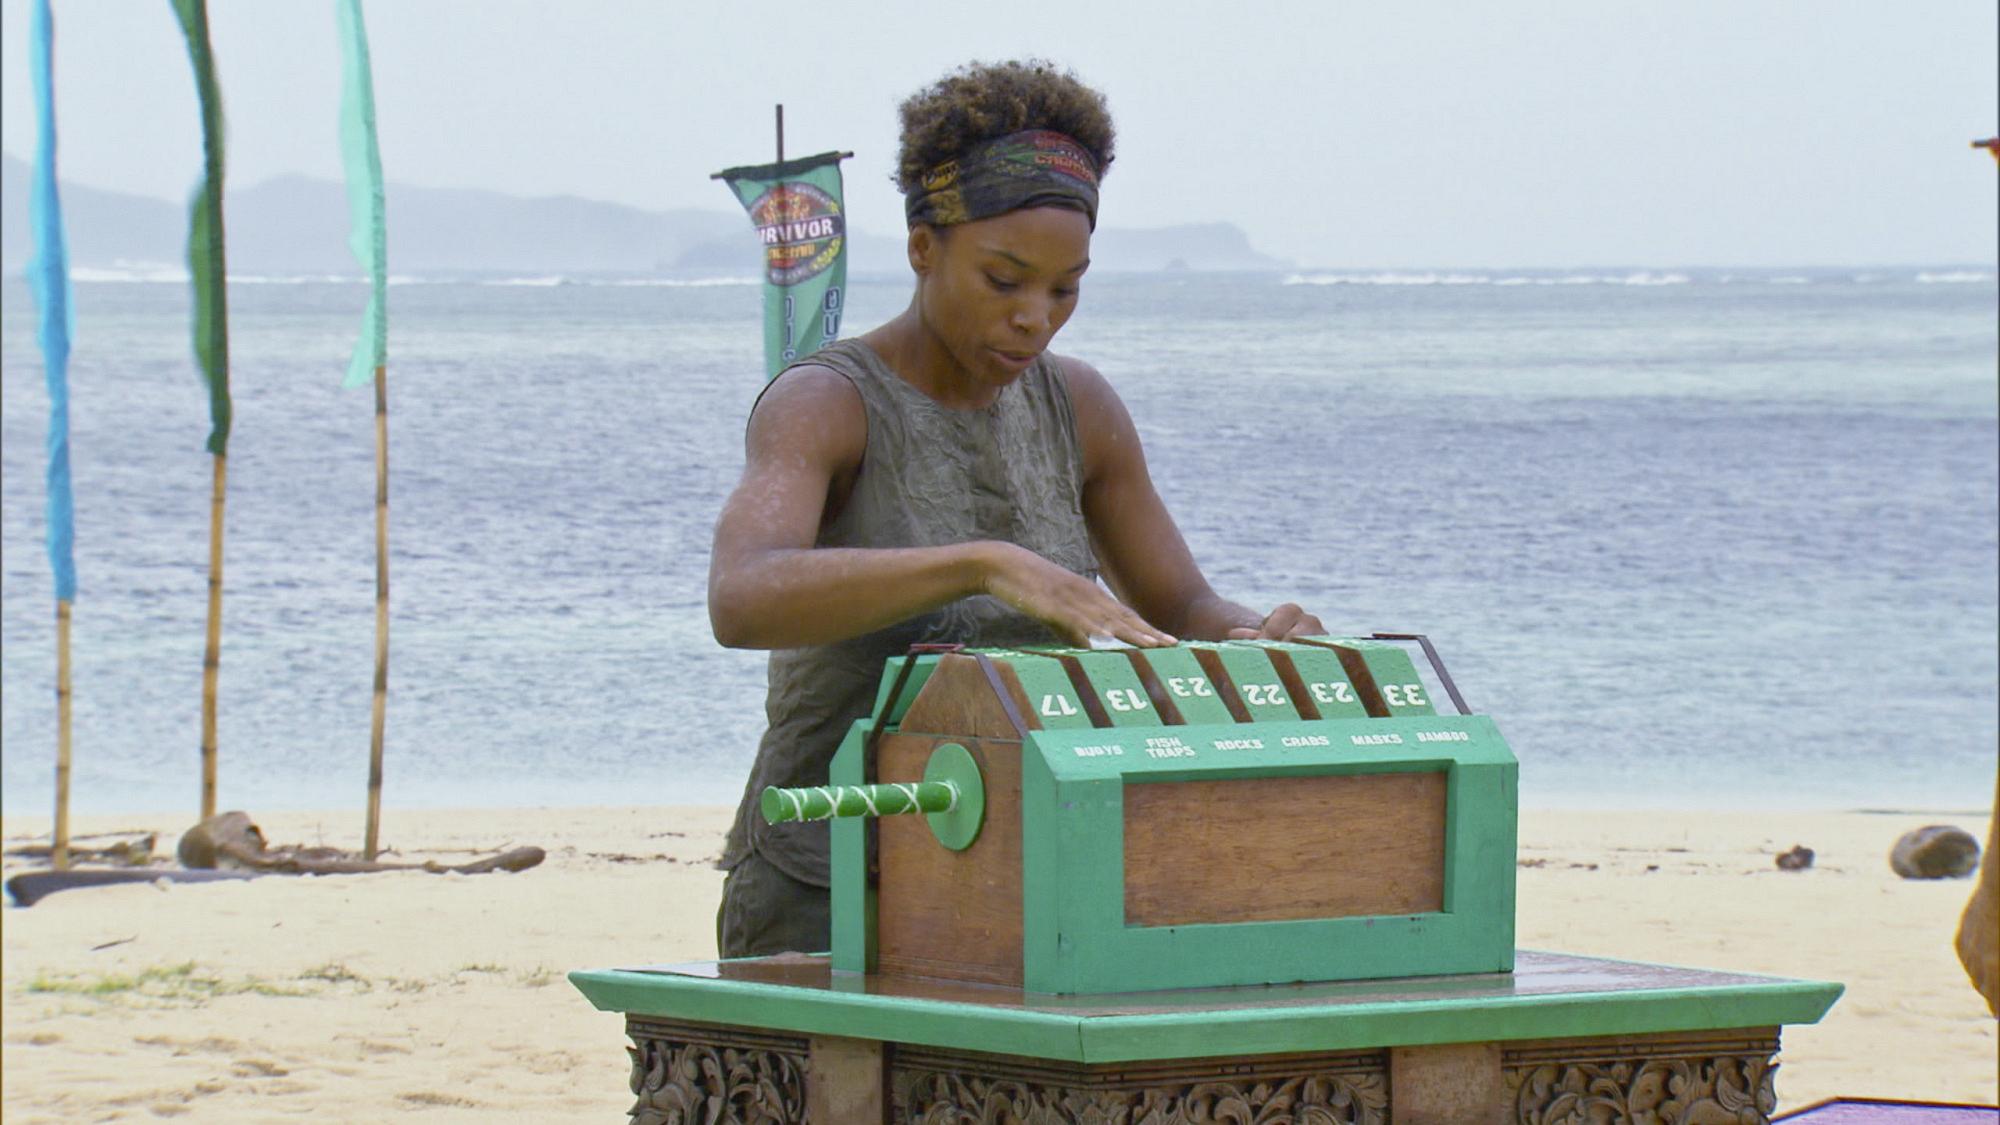 Tasha competes in Season 28 Episode 11